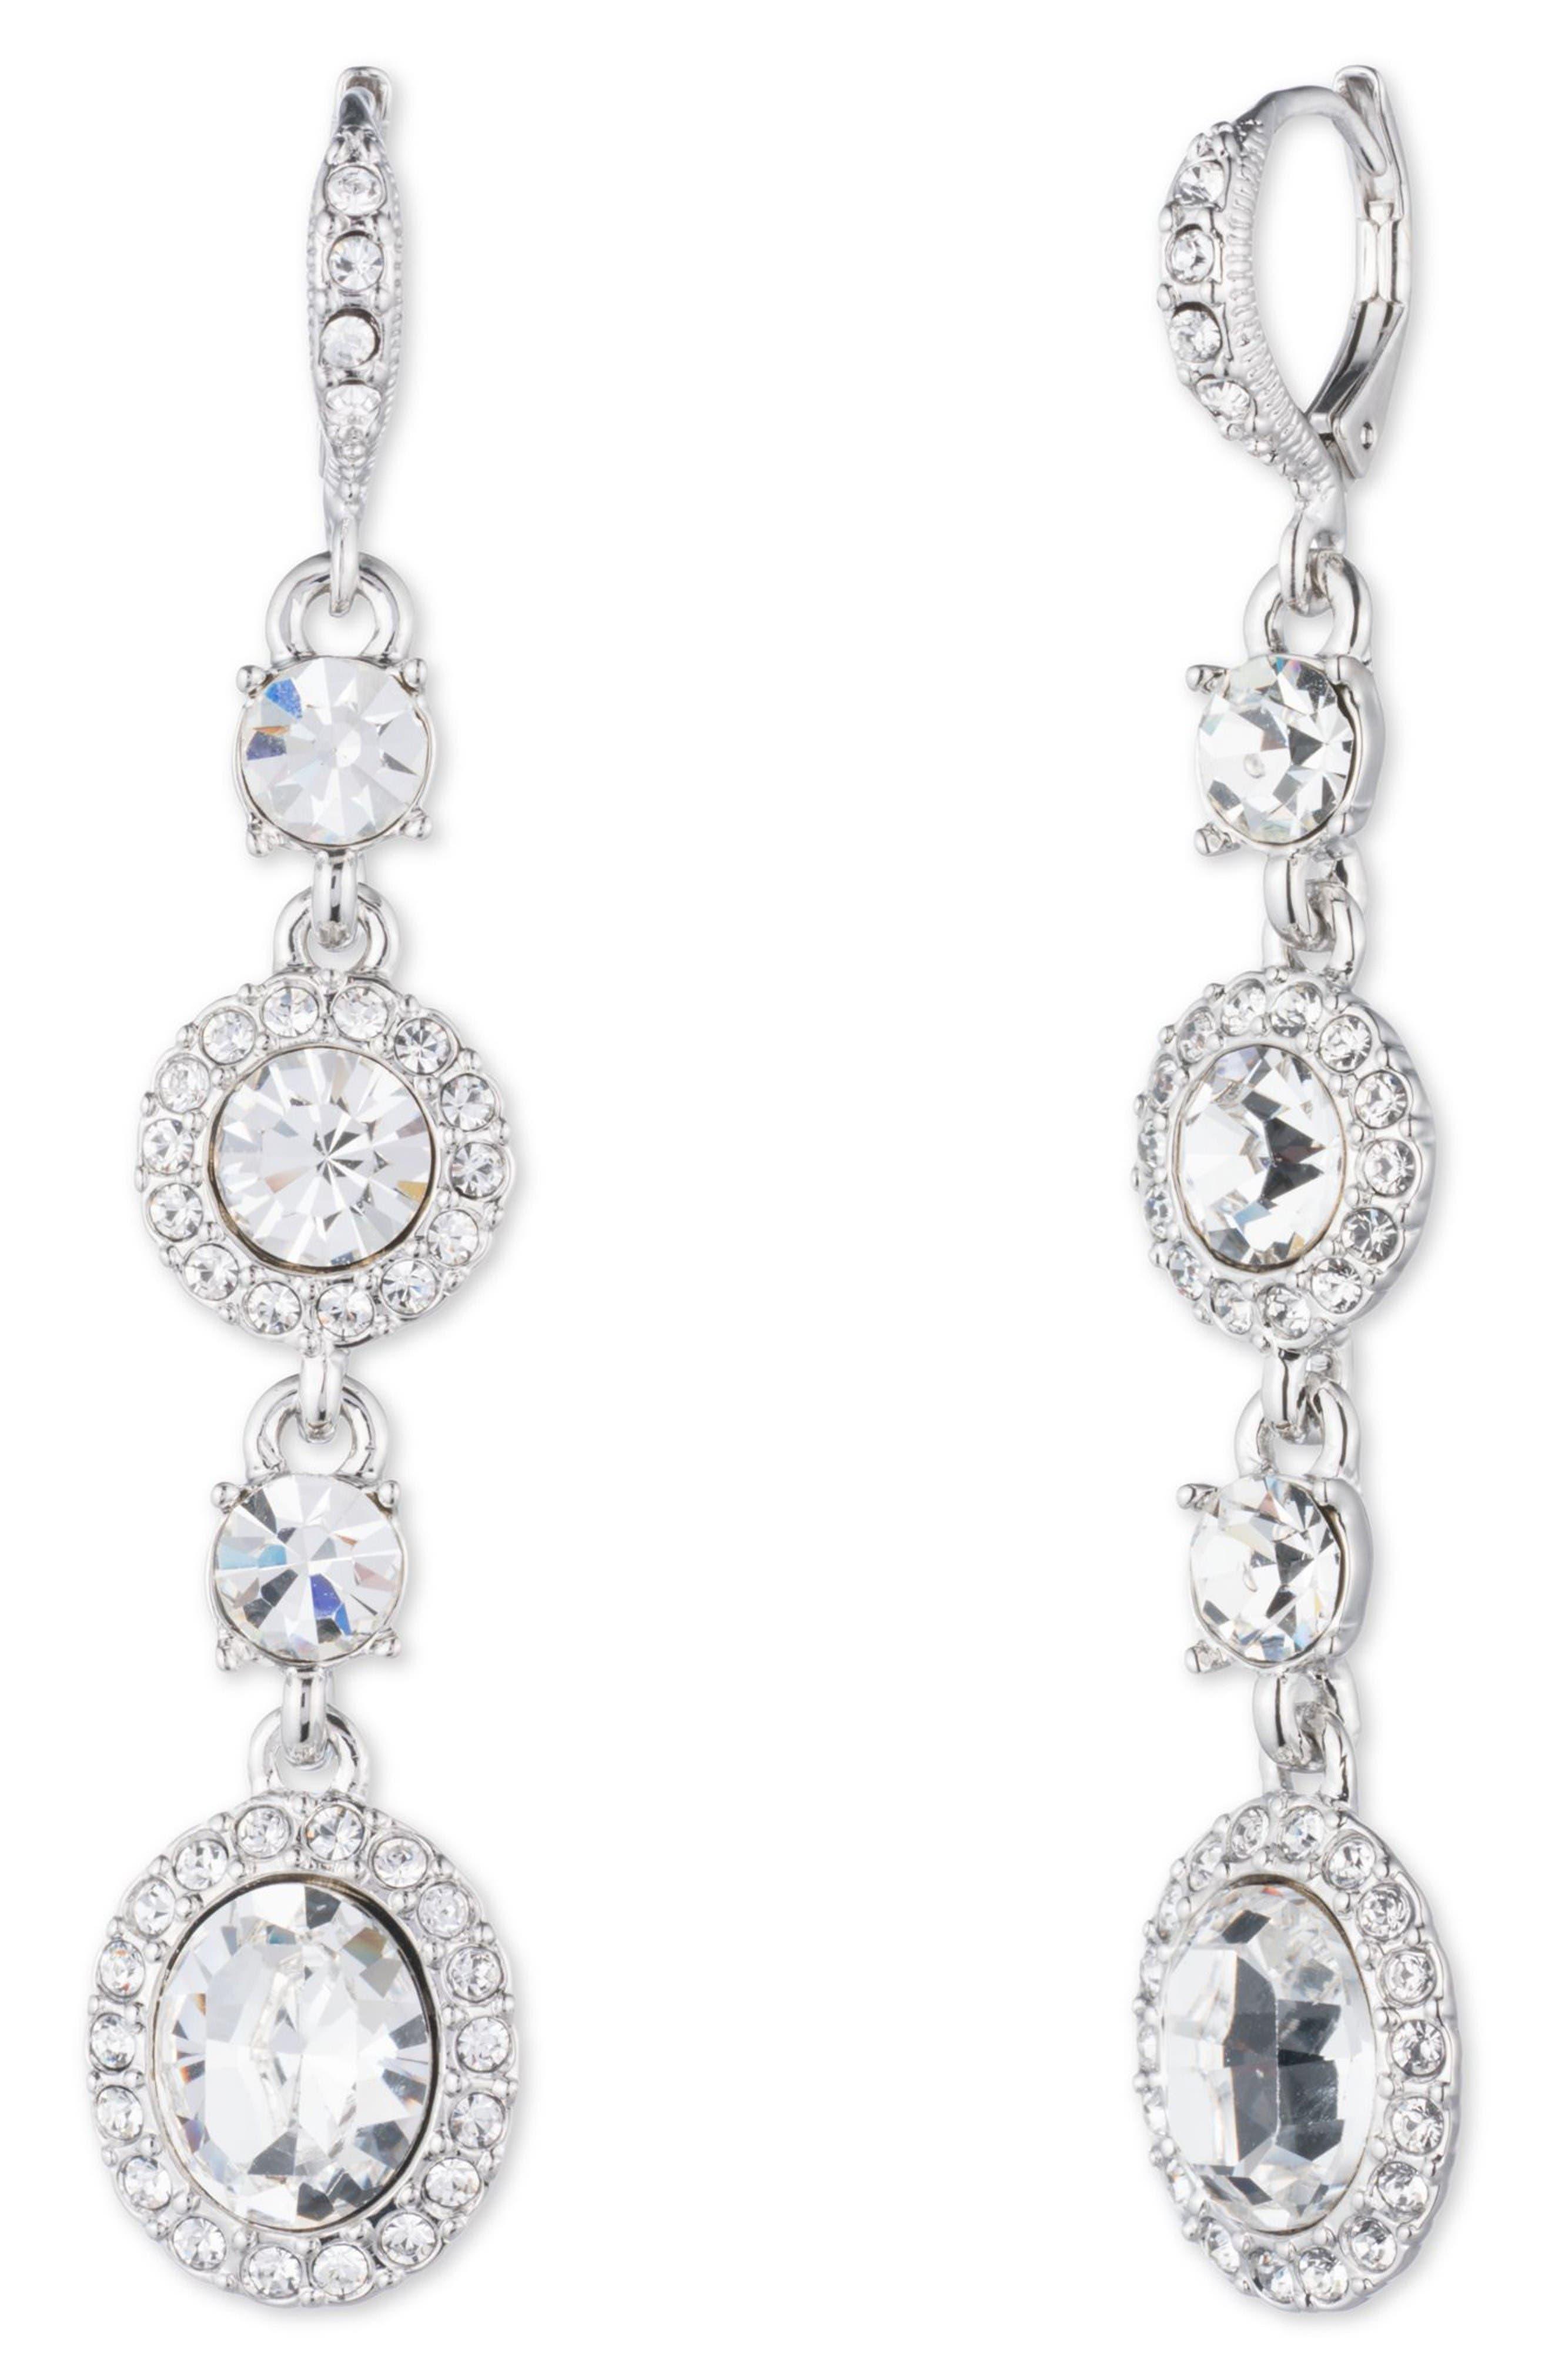 Crystal Linear Drop Earrings,                             Main thumbnail 1, color,                             Silver